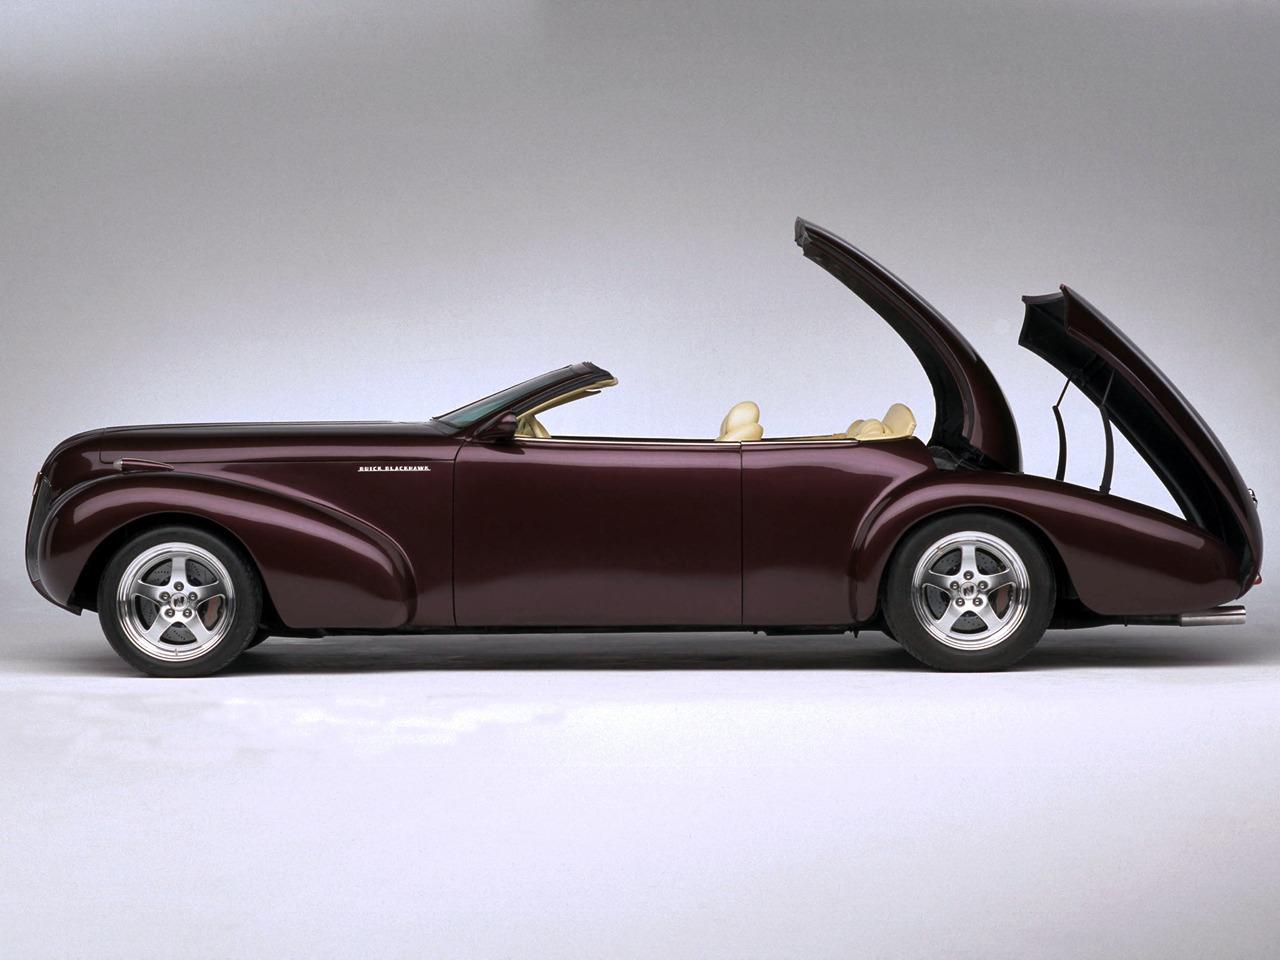 Buick Blackhawk 2000 Old Concept Cars